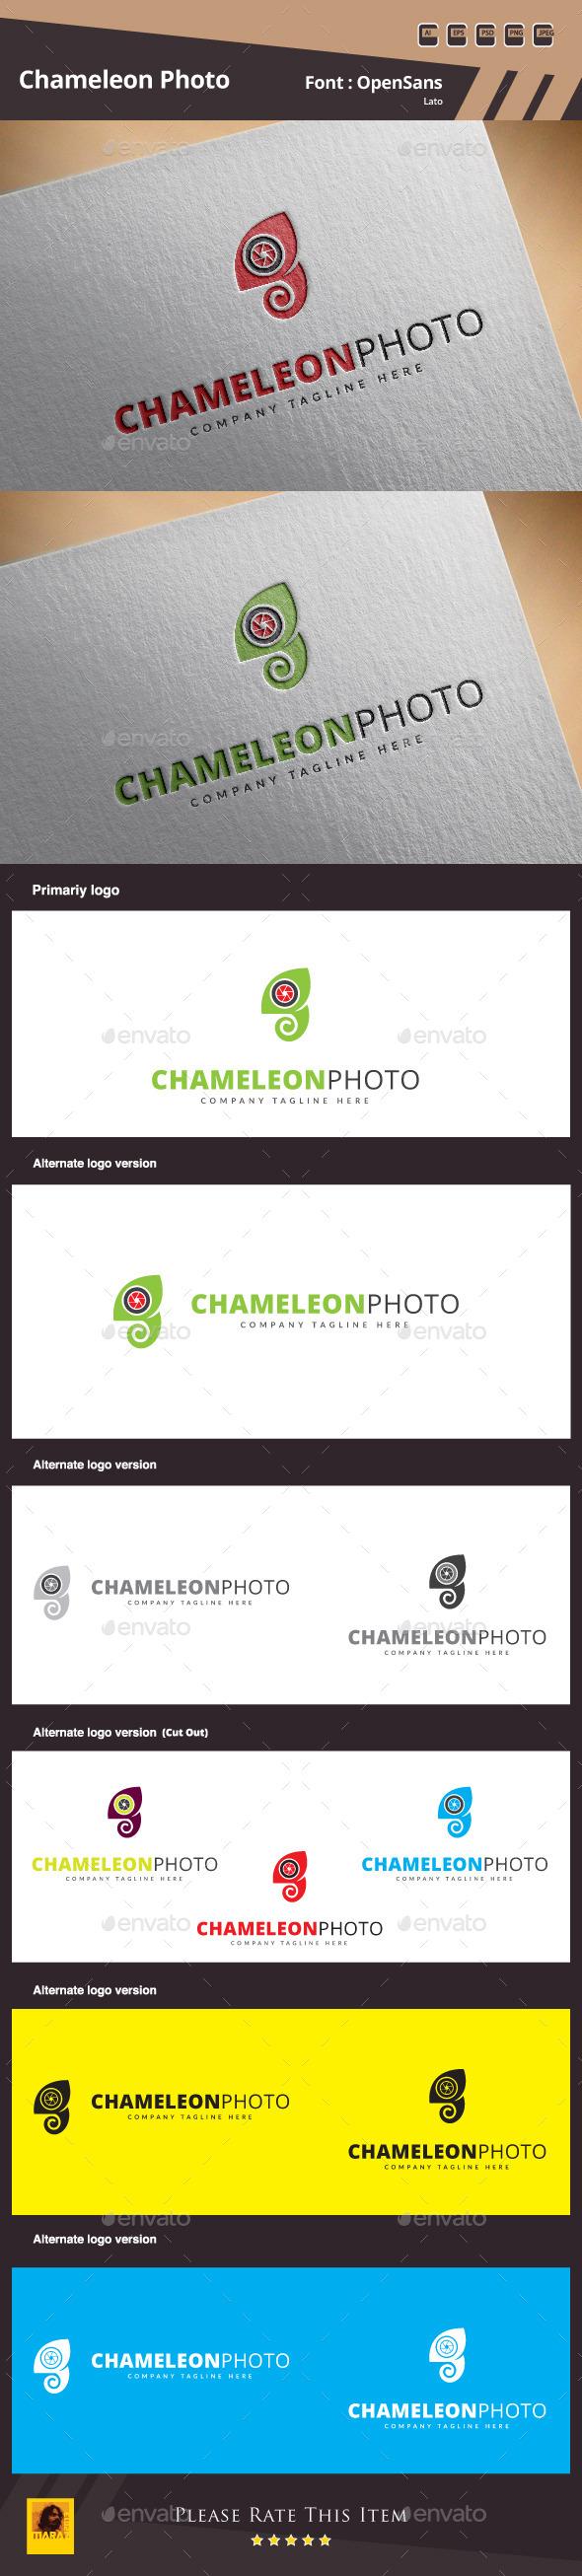 GraphicRiver Chameleon Photo Logo Template 11042347